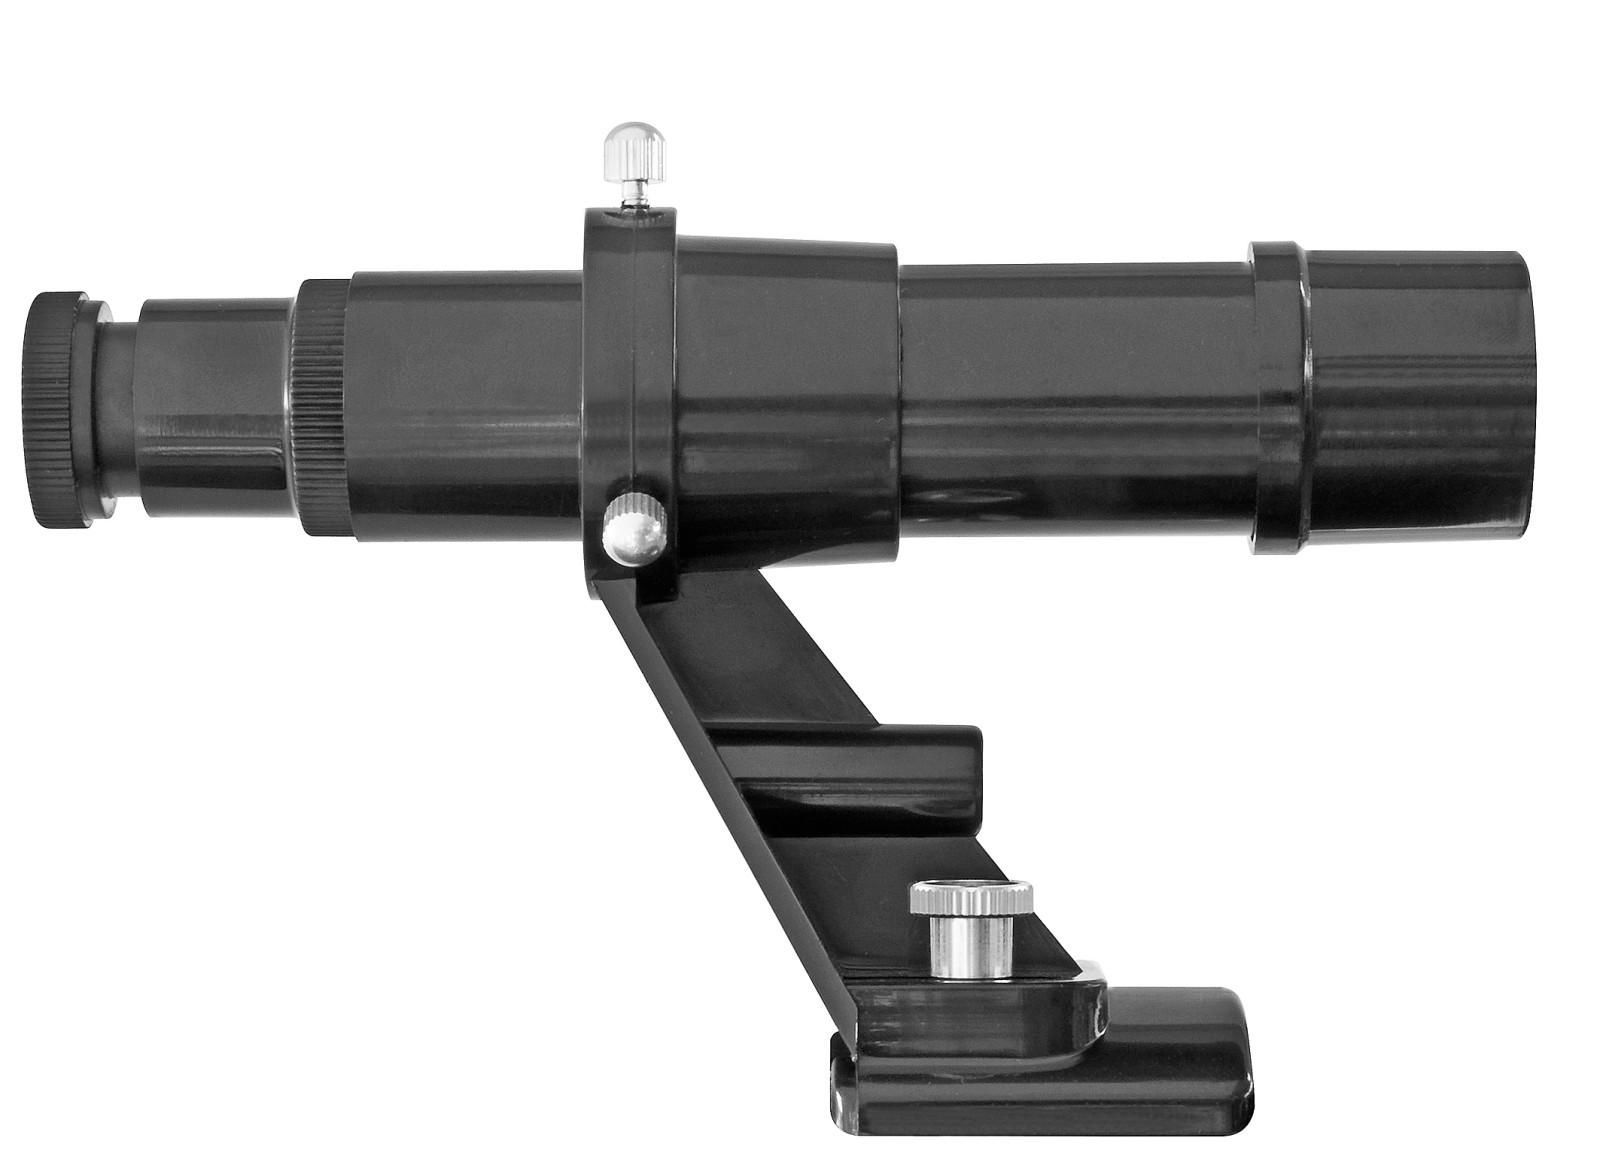 National geographic reflektor teleskop az bresser